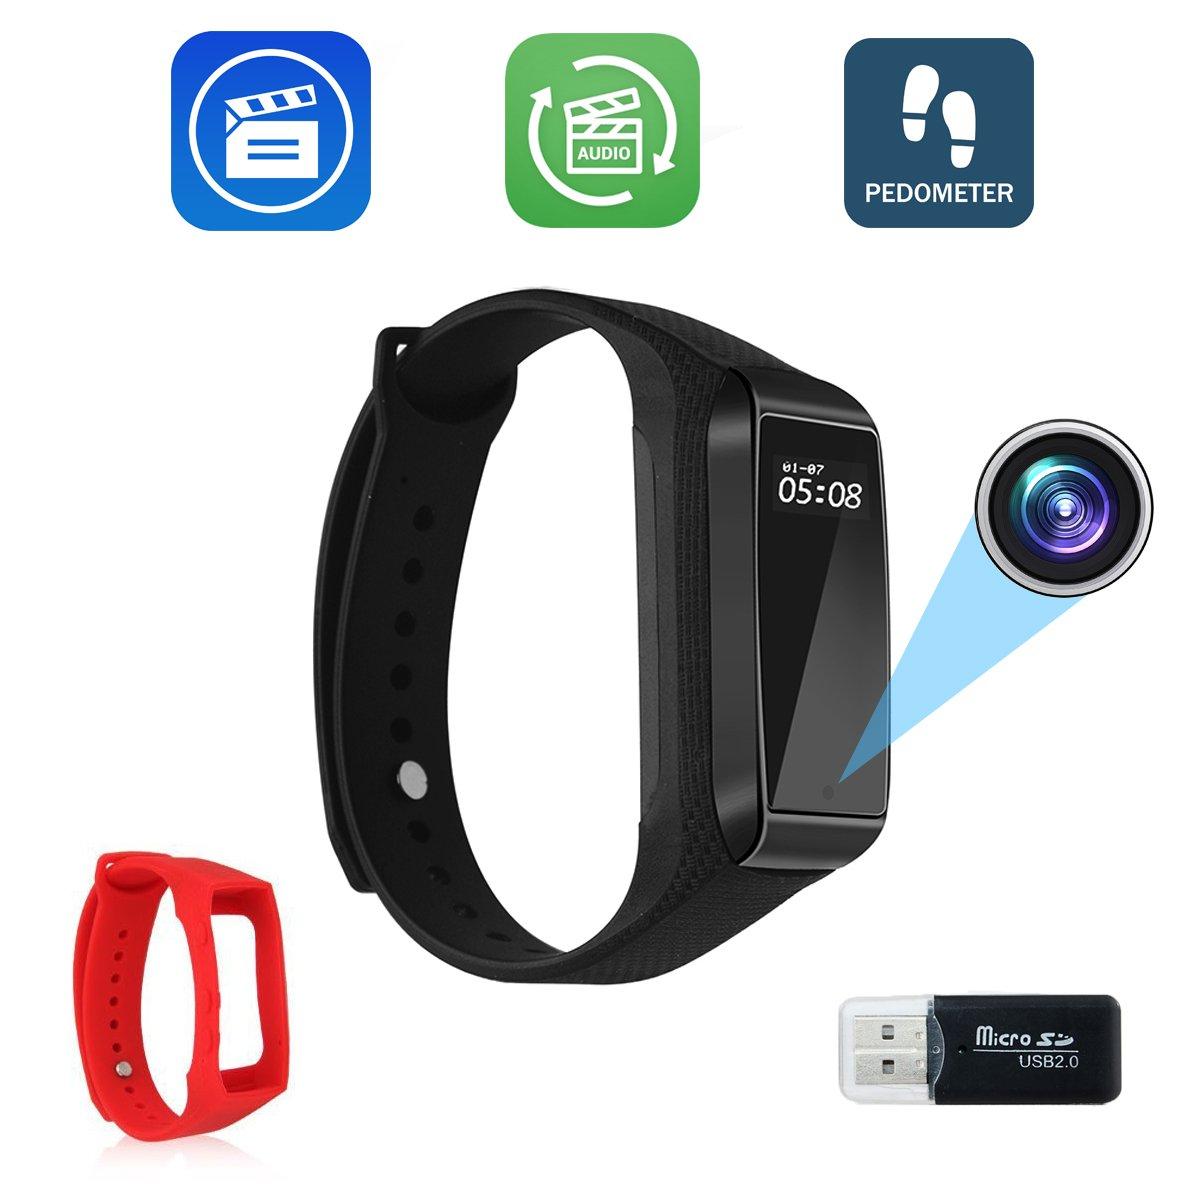 Bysameyee Smart Bracelet Video Recording Camera, HD 1080P Mini DVR Cam with Steps Tracking – Black Adjustable Wristband by Bysameyee